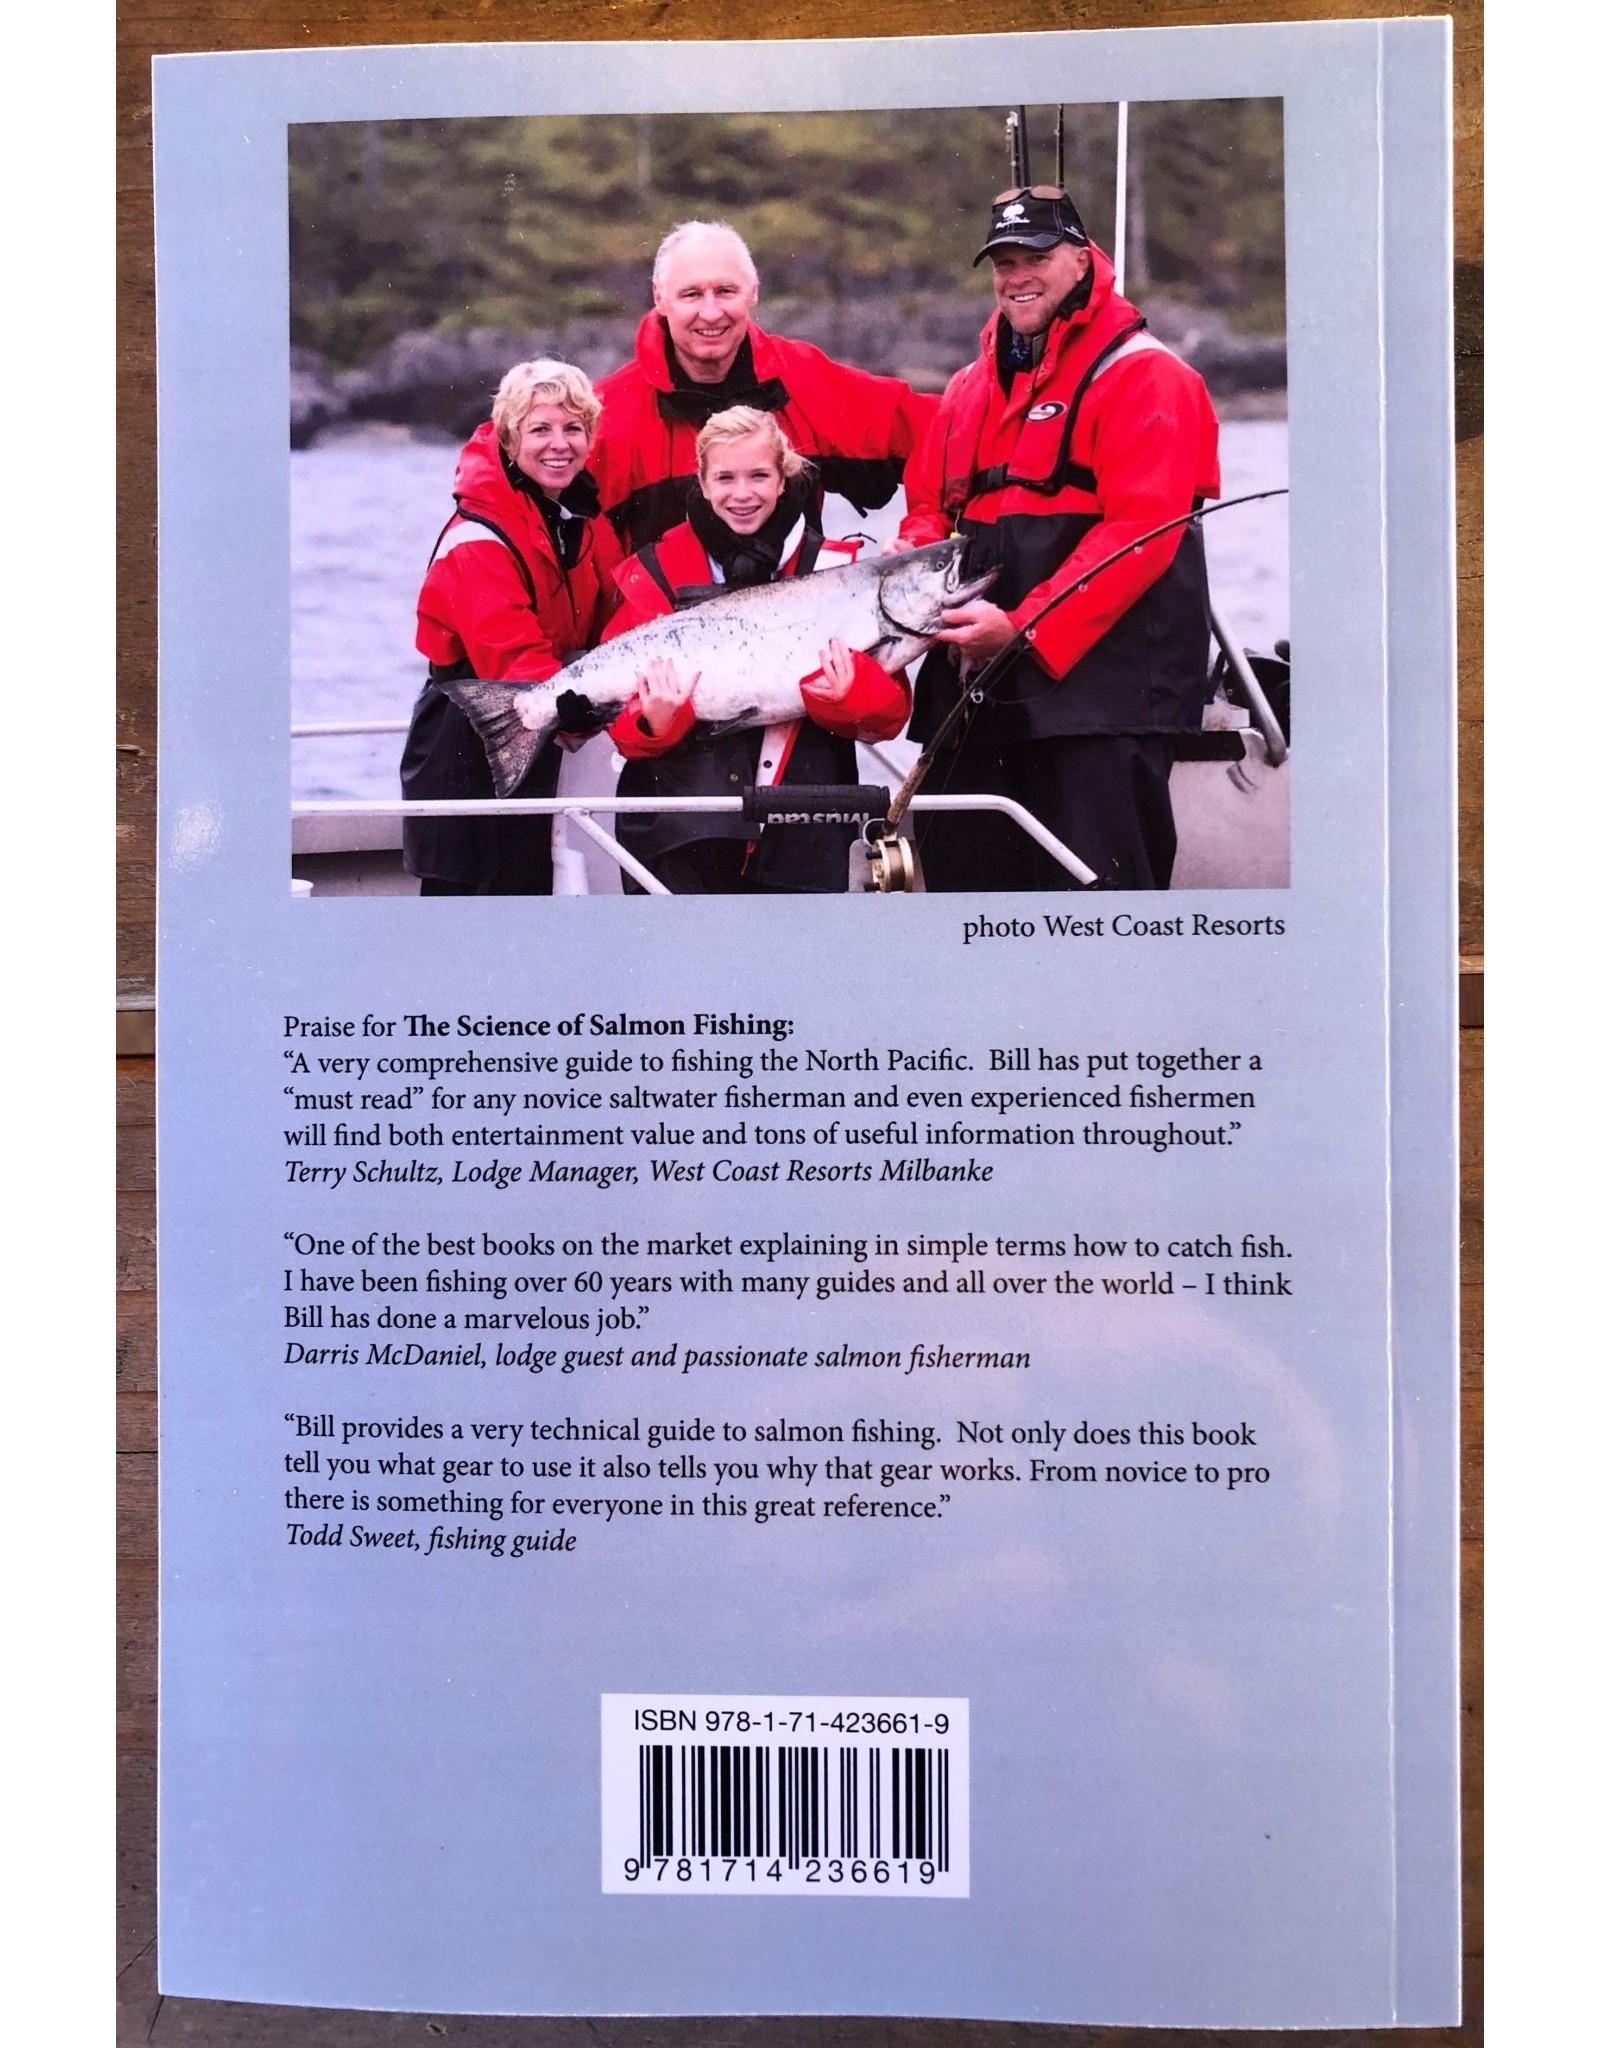 MARINE HAND BOOKS (LEONA 604789-2492 THE SCIENCE OF SALMON FISHING BY BILL HAYMOND